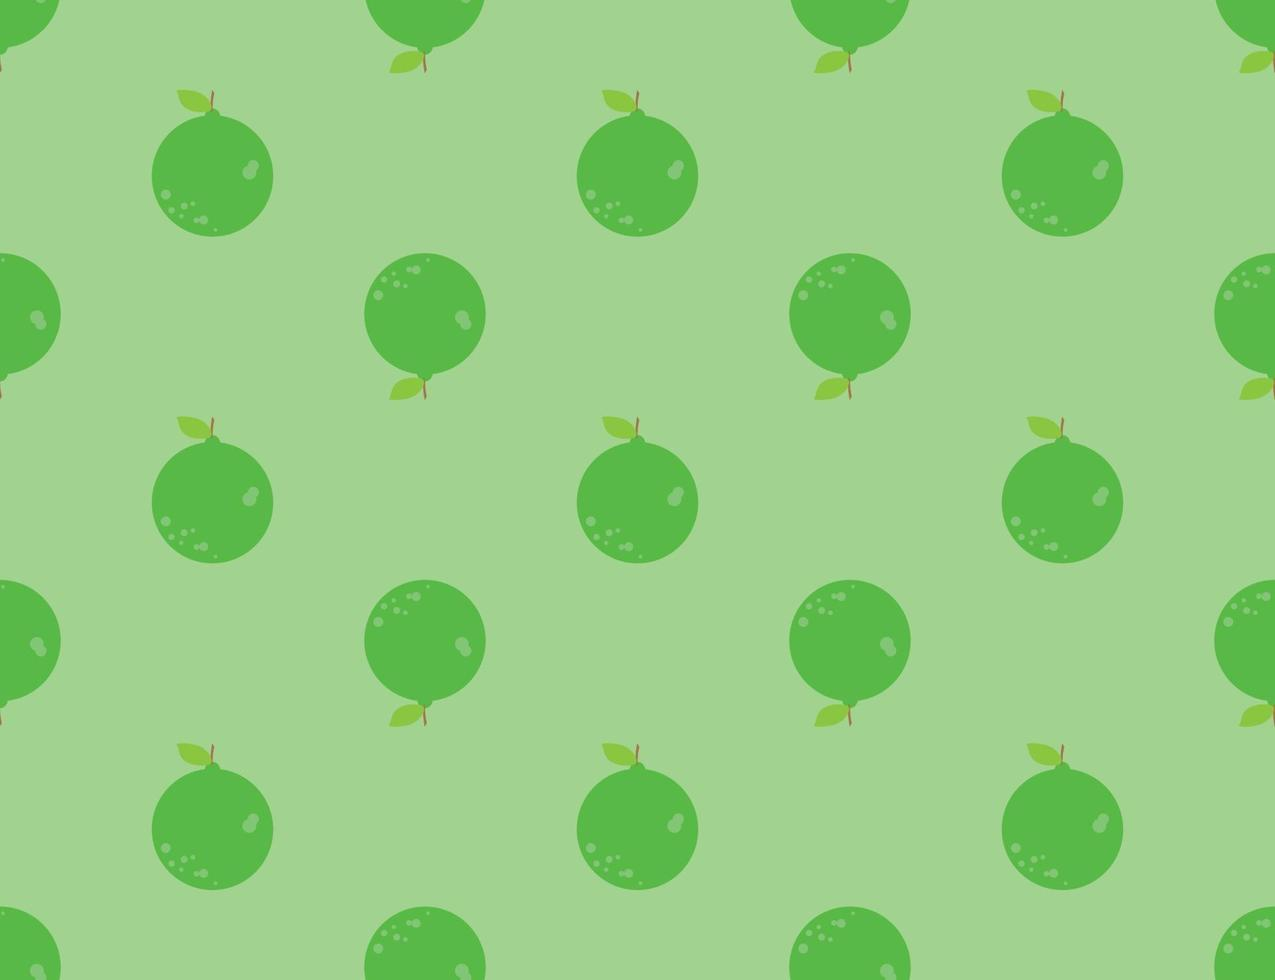 lindgrünes Muster, grüner Hintergrund vektor